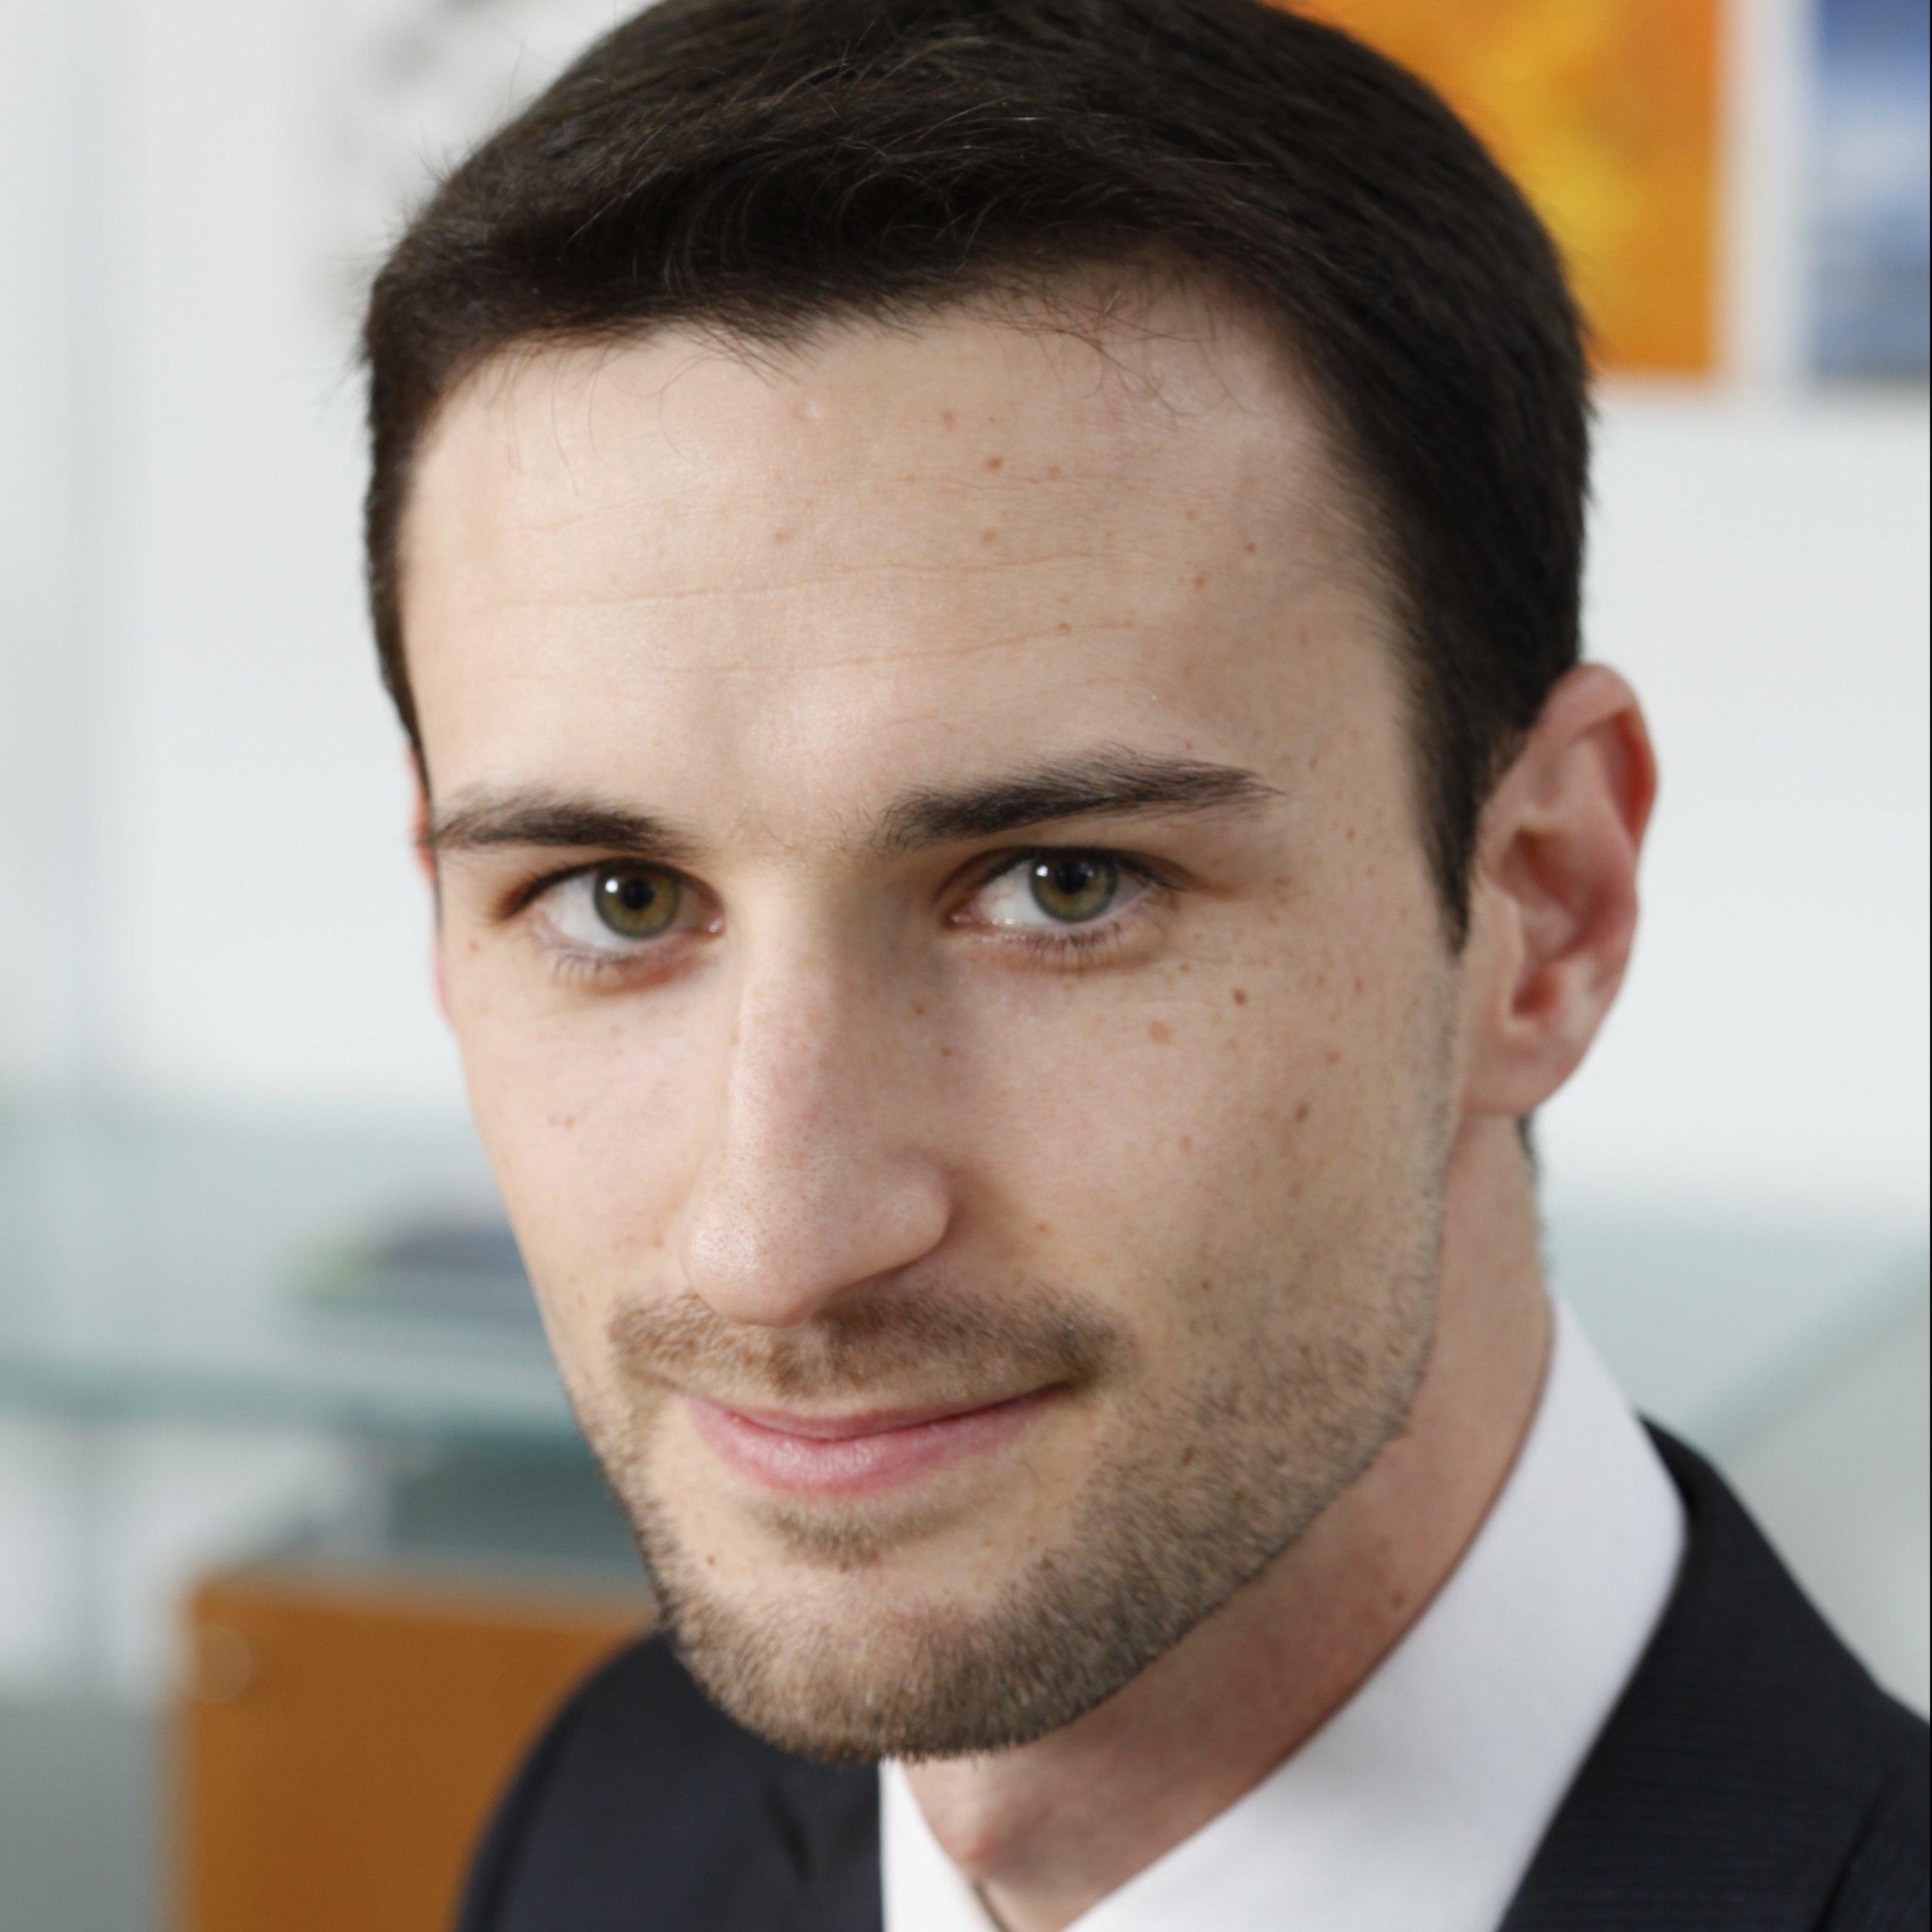 Julien CheHowah - Portfolio Manager, European EquitiesFOURPOINTS Investment Managers (Paris)